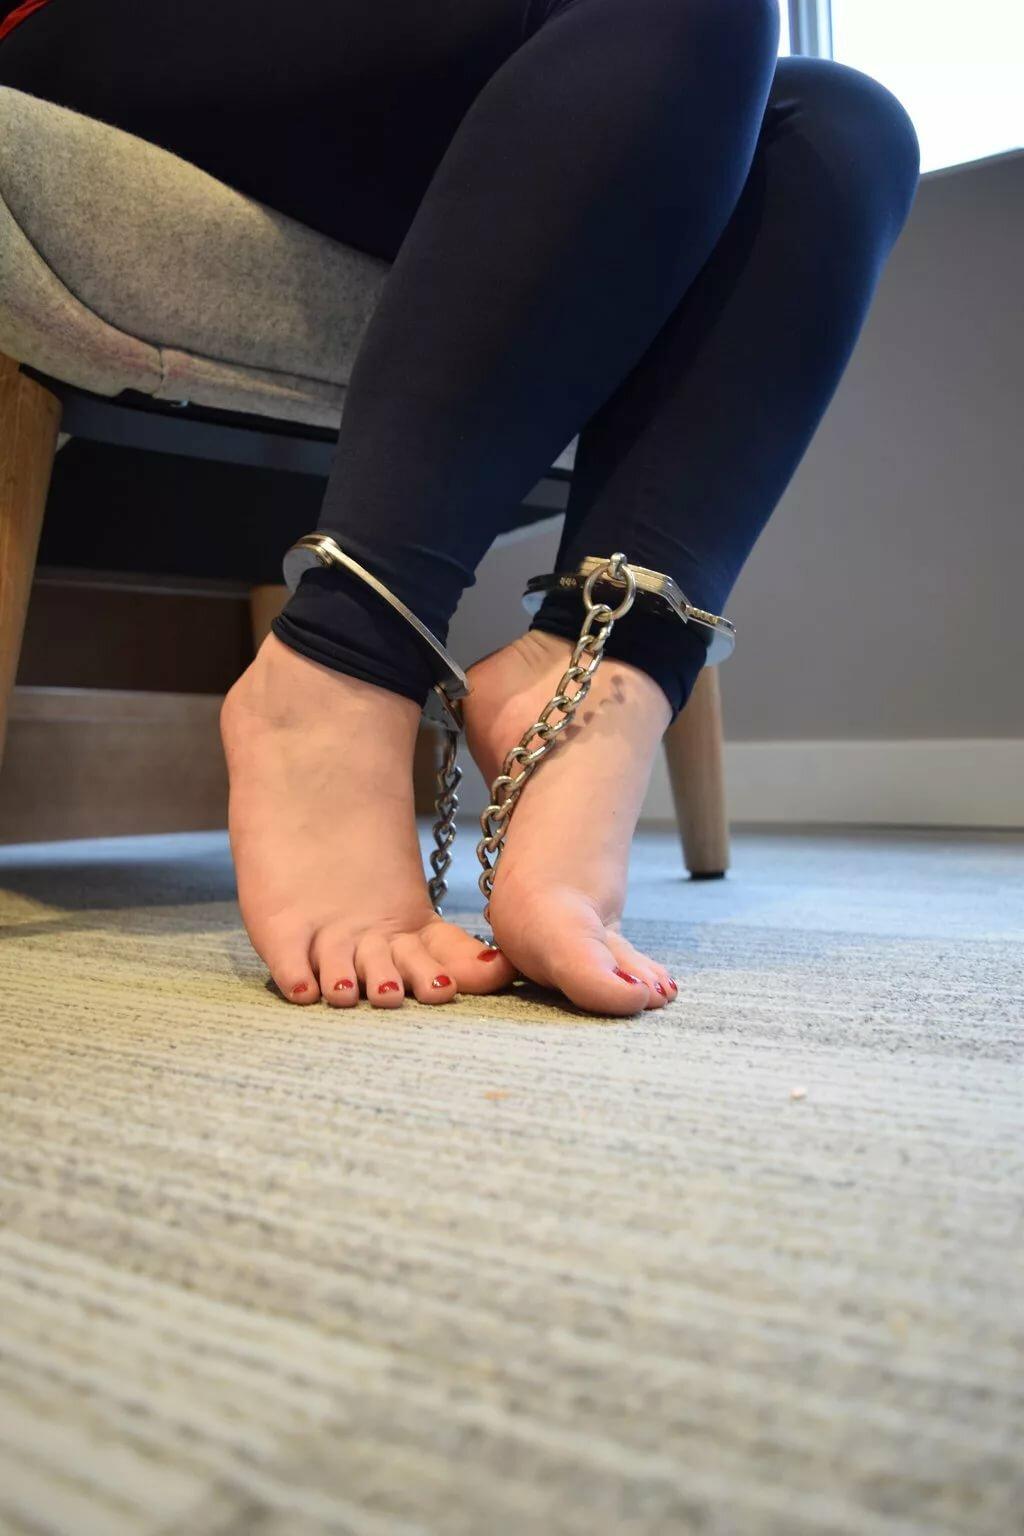 Tied up feet #6